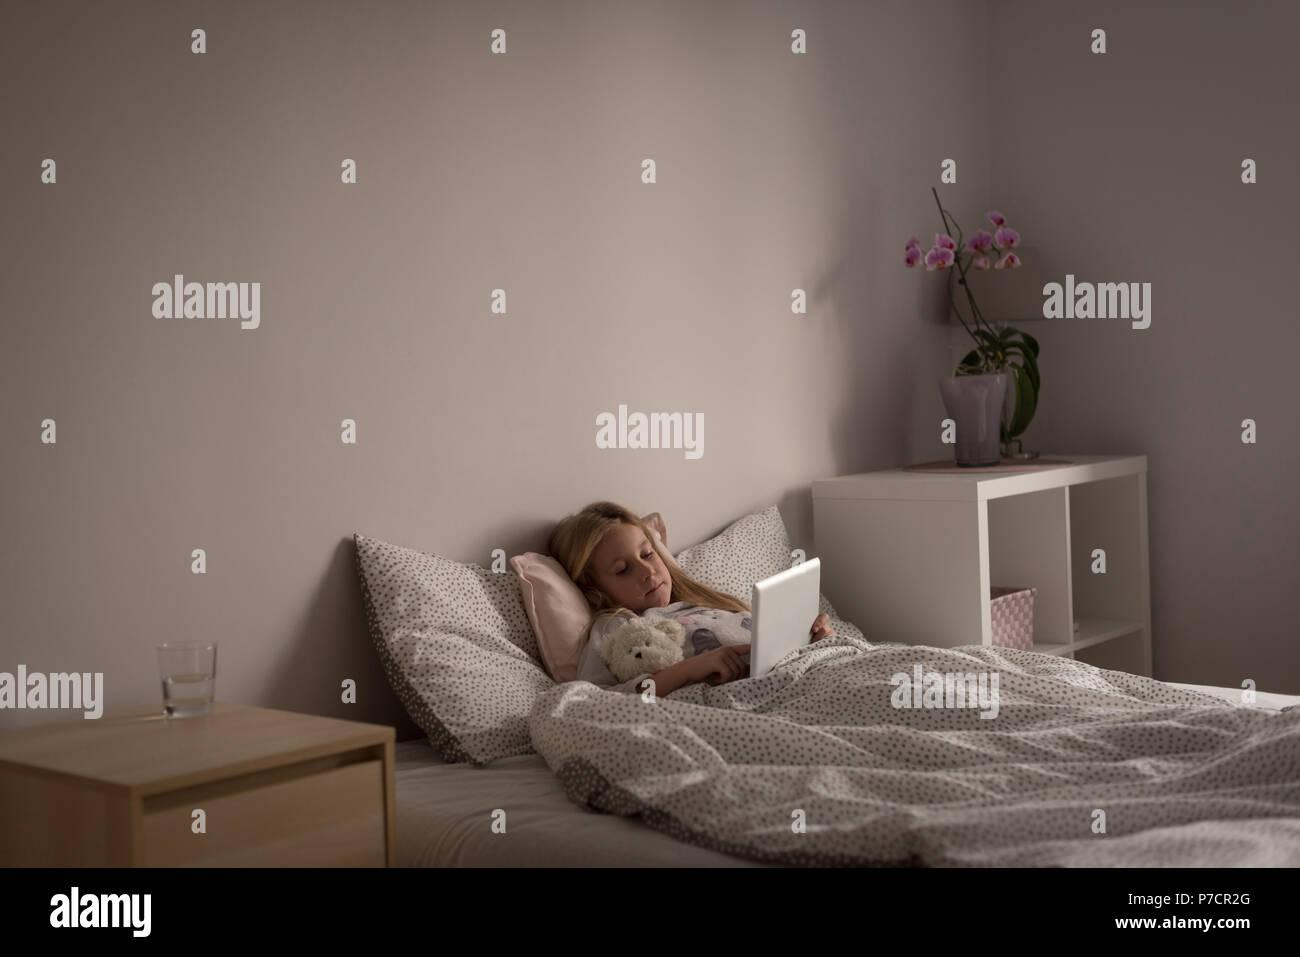 Girl using digital tablet in bedroom - Stock Image